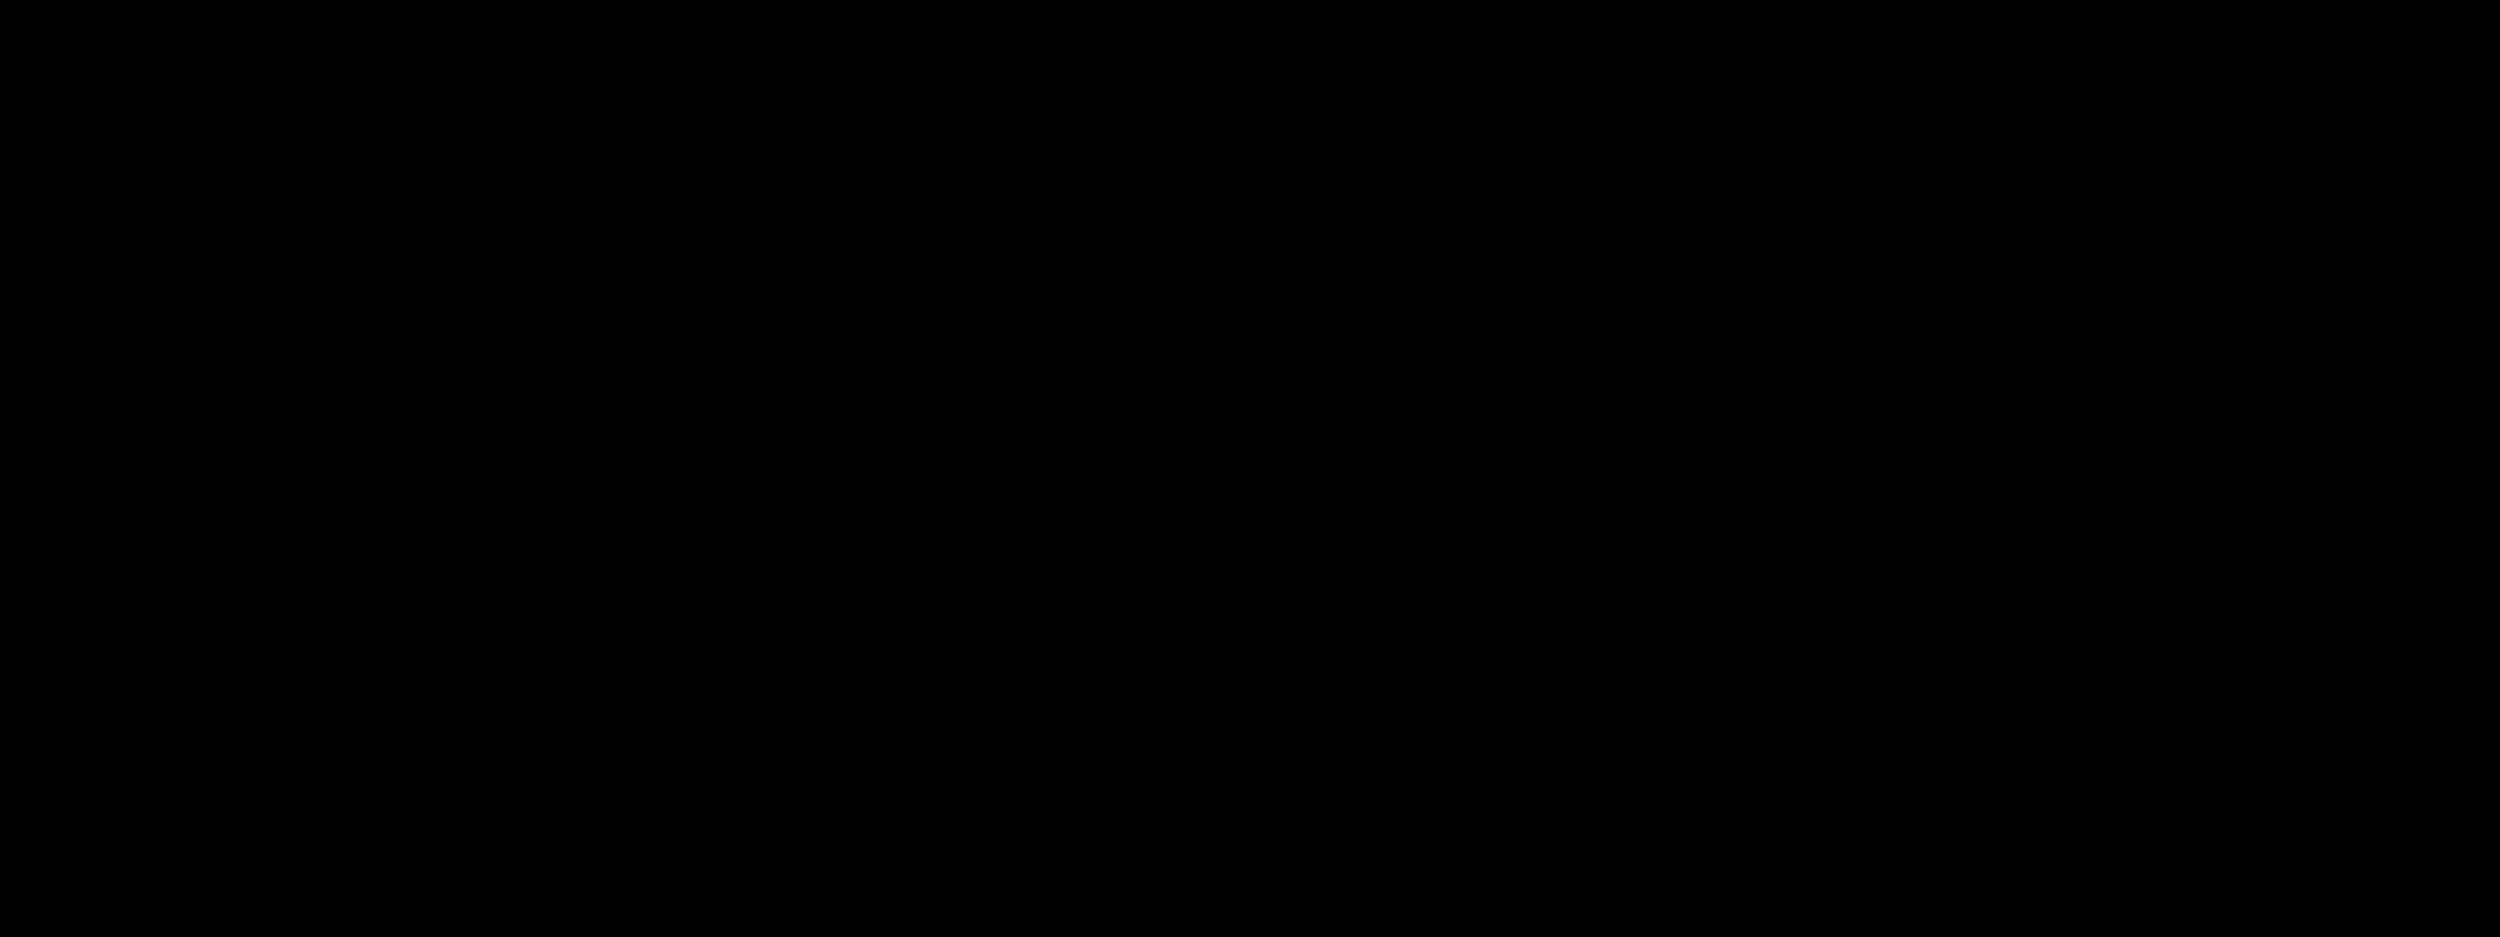 AM&AA logo